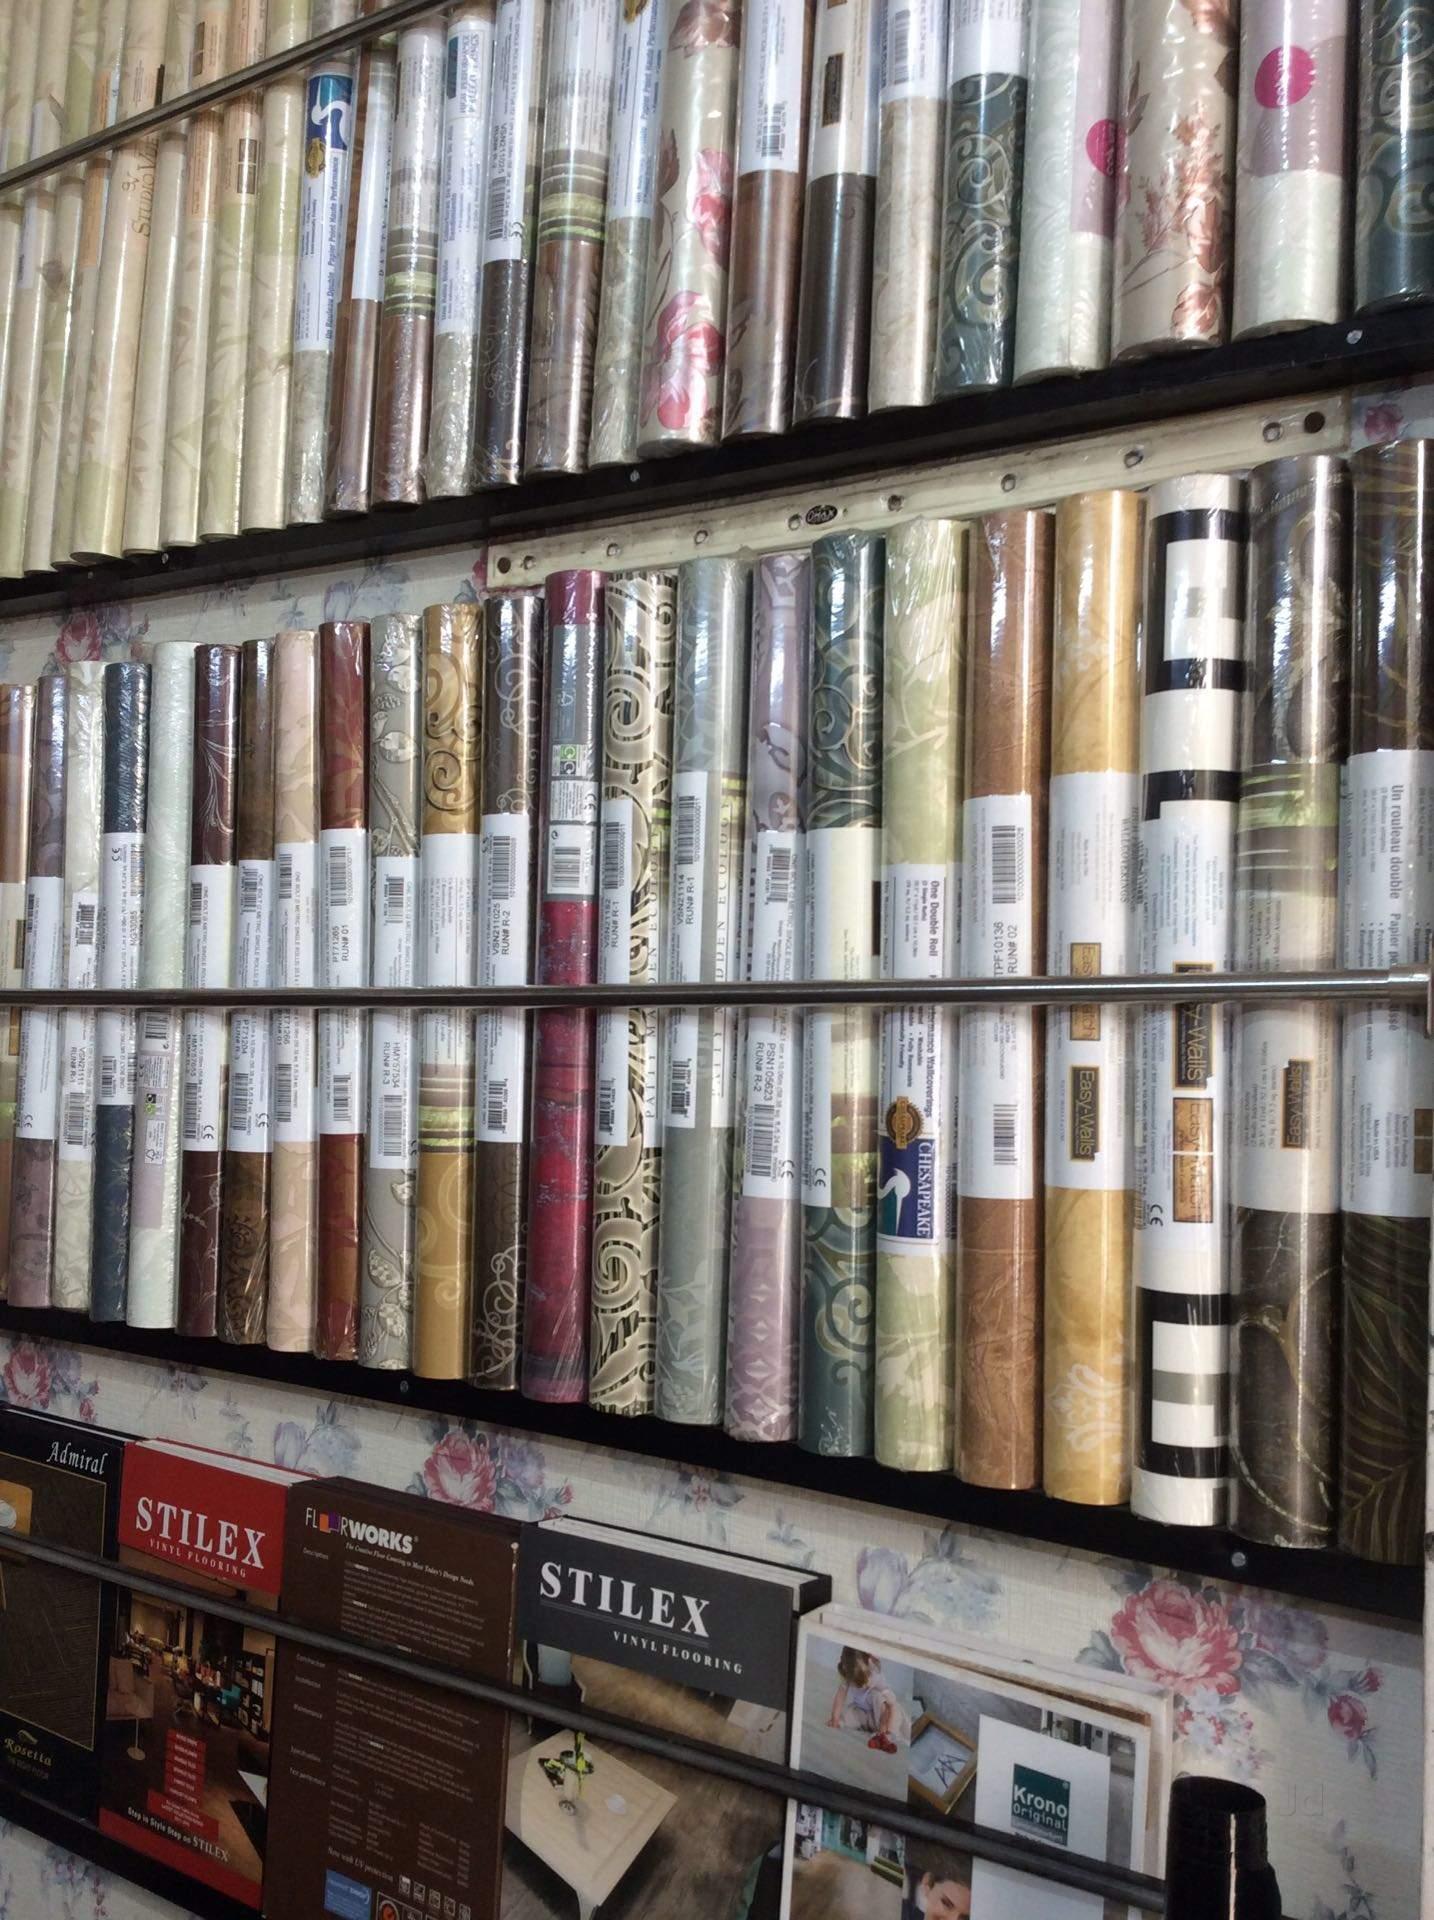 Novel , HD Wallpaper & Backgrounds